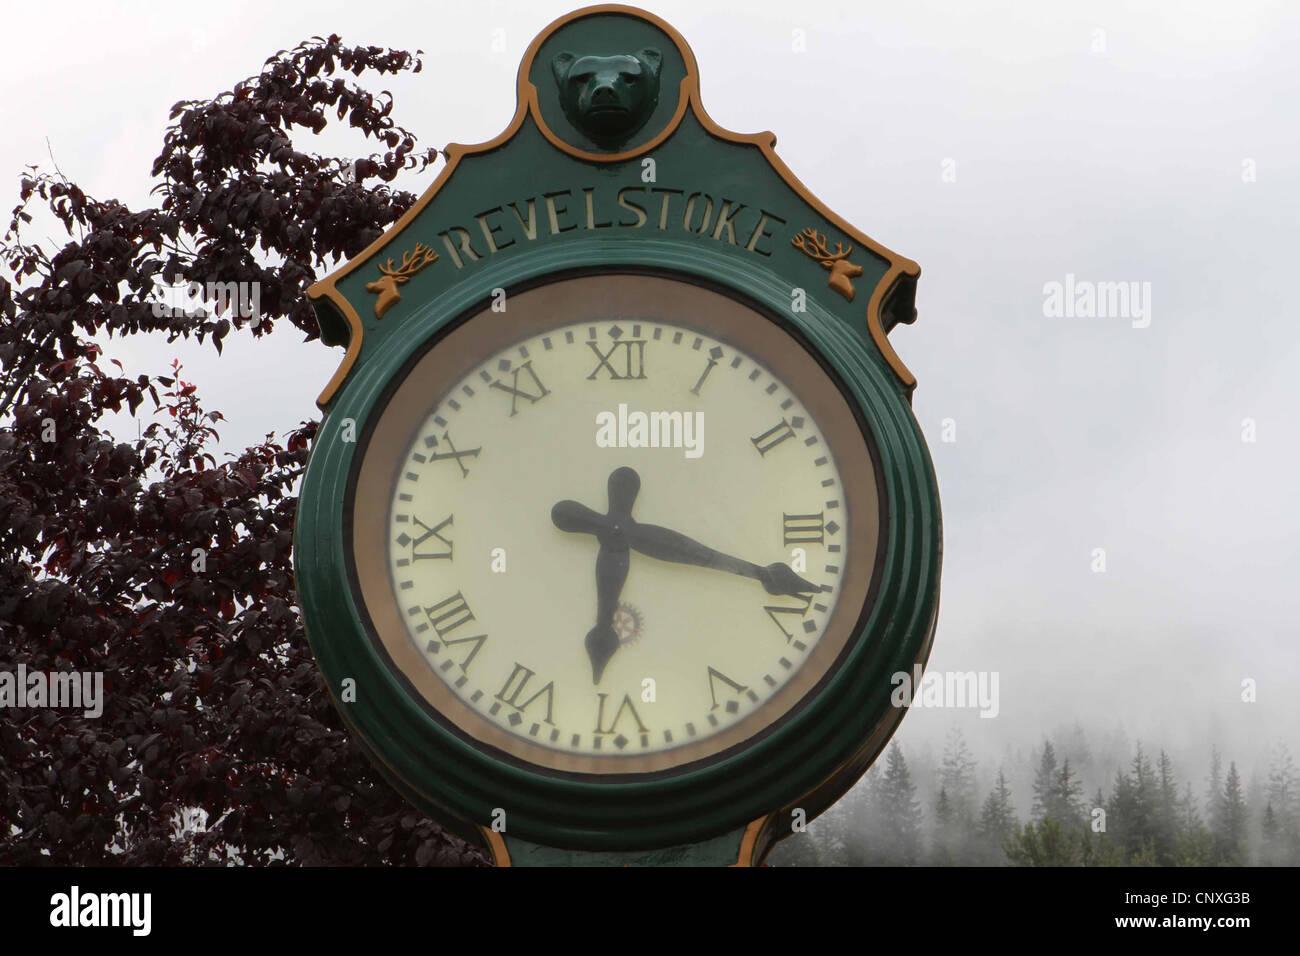 Antique town clock - Stock Image